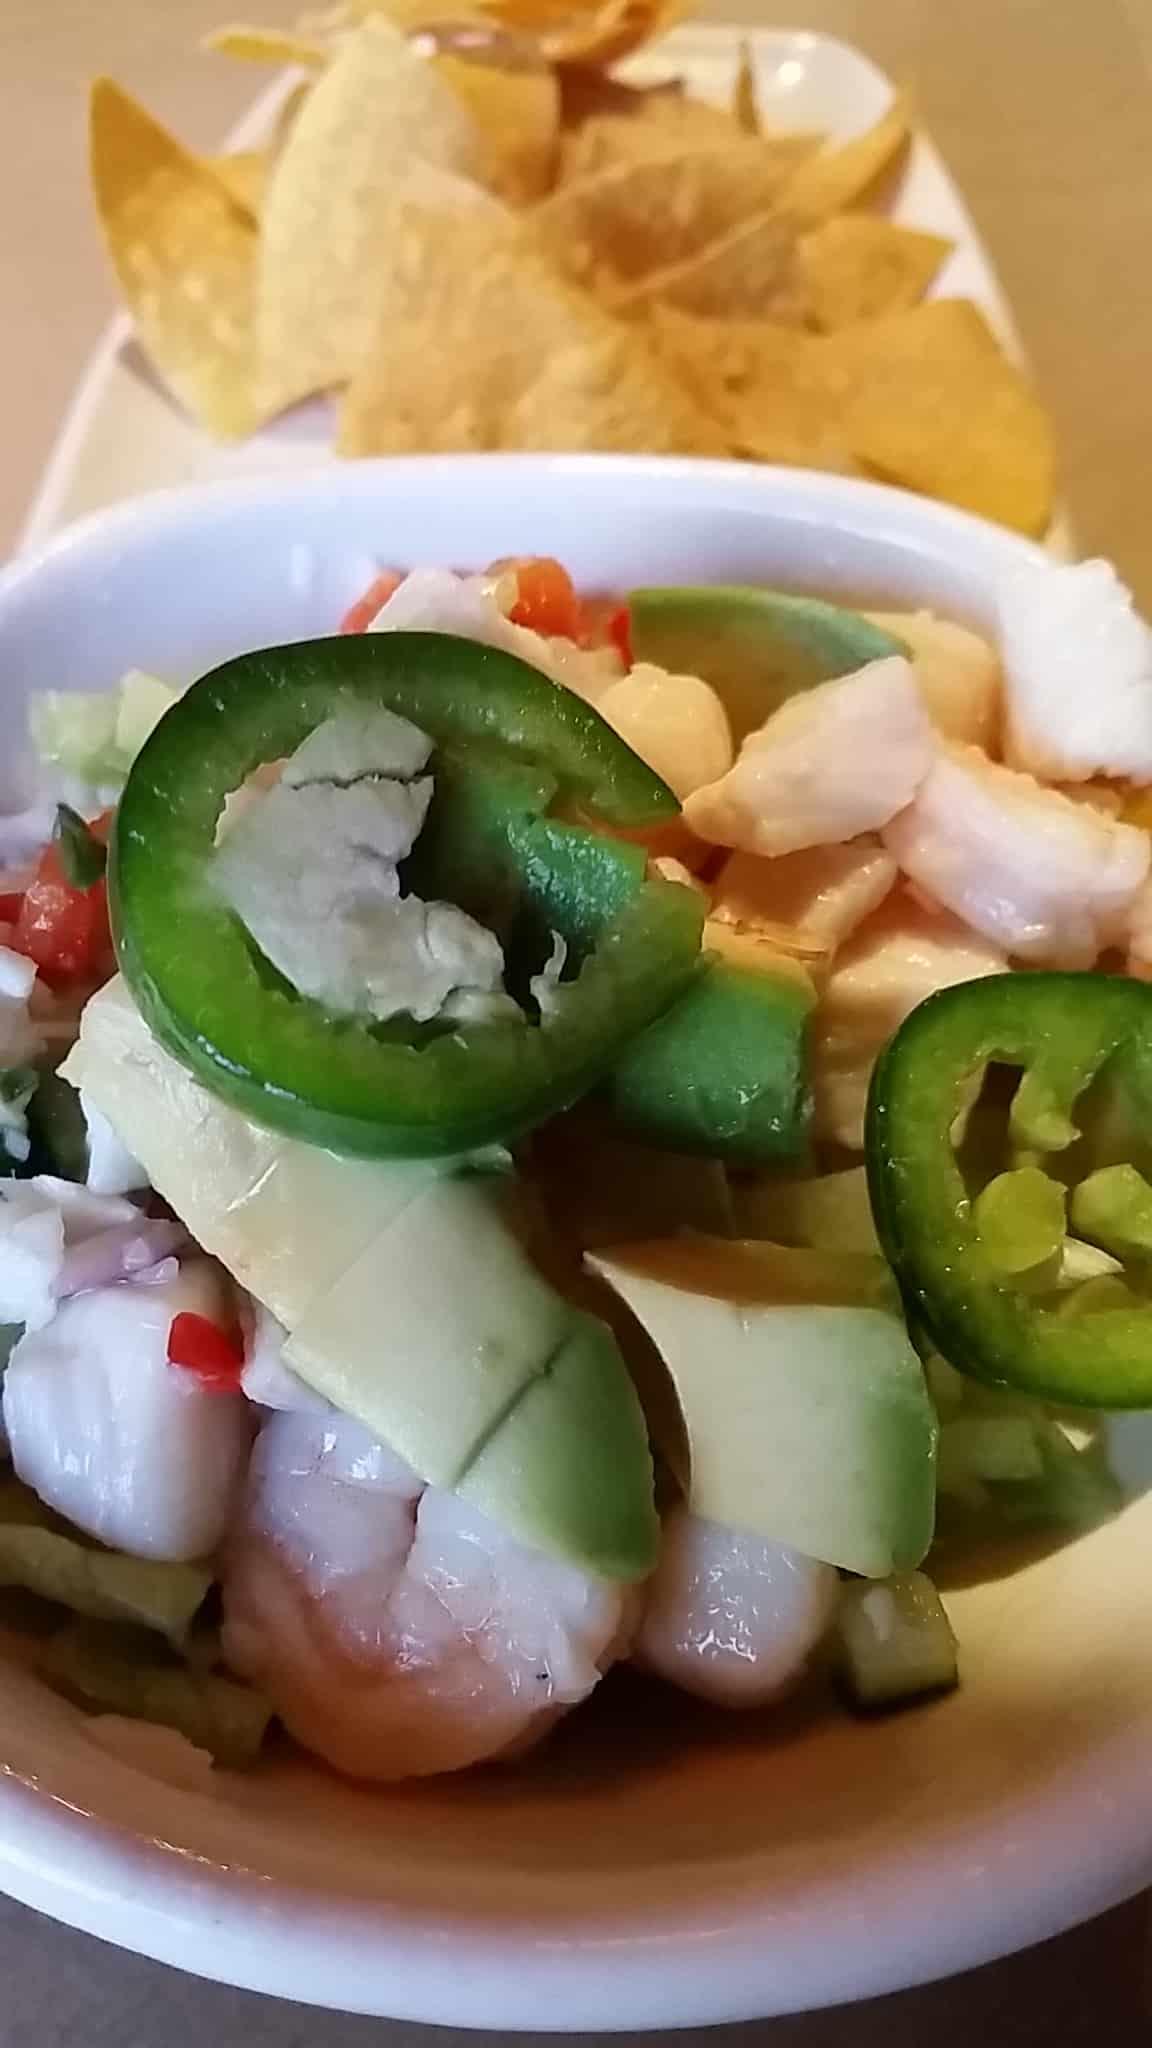 Bonefish grill debuts new menu items dallas socials for Fish bone grill dallas